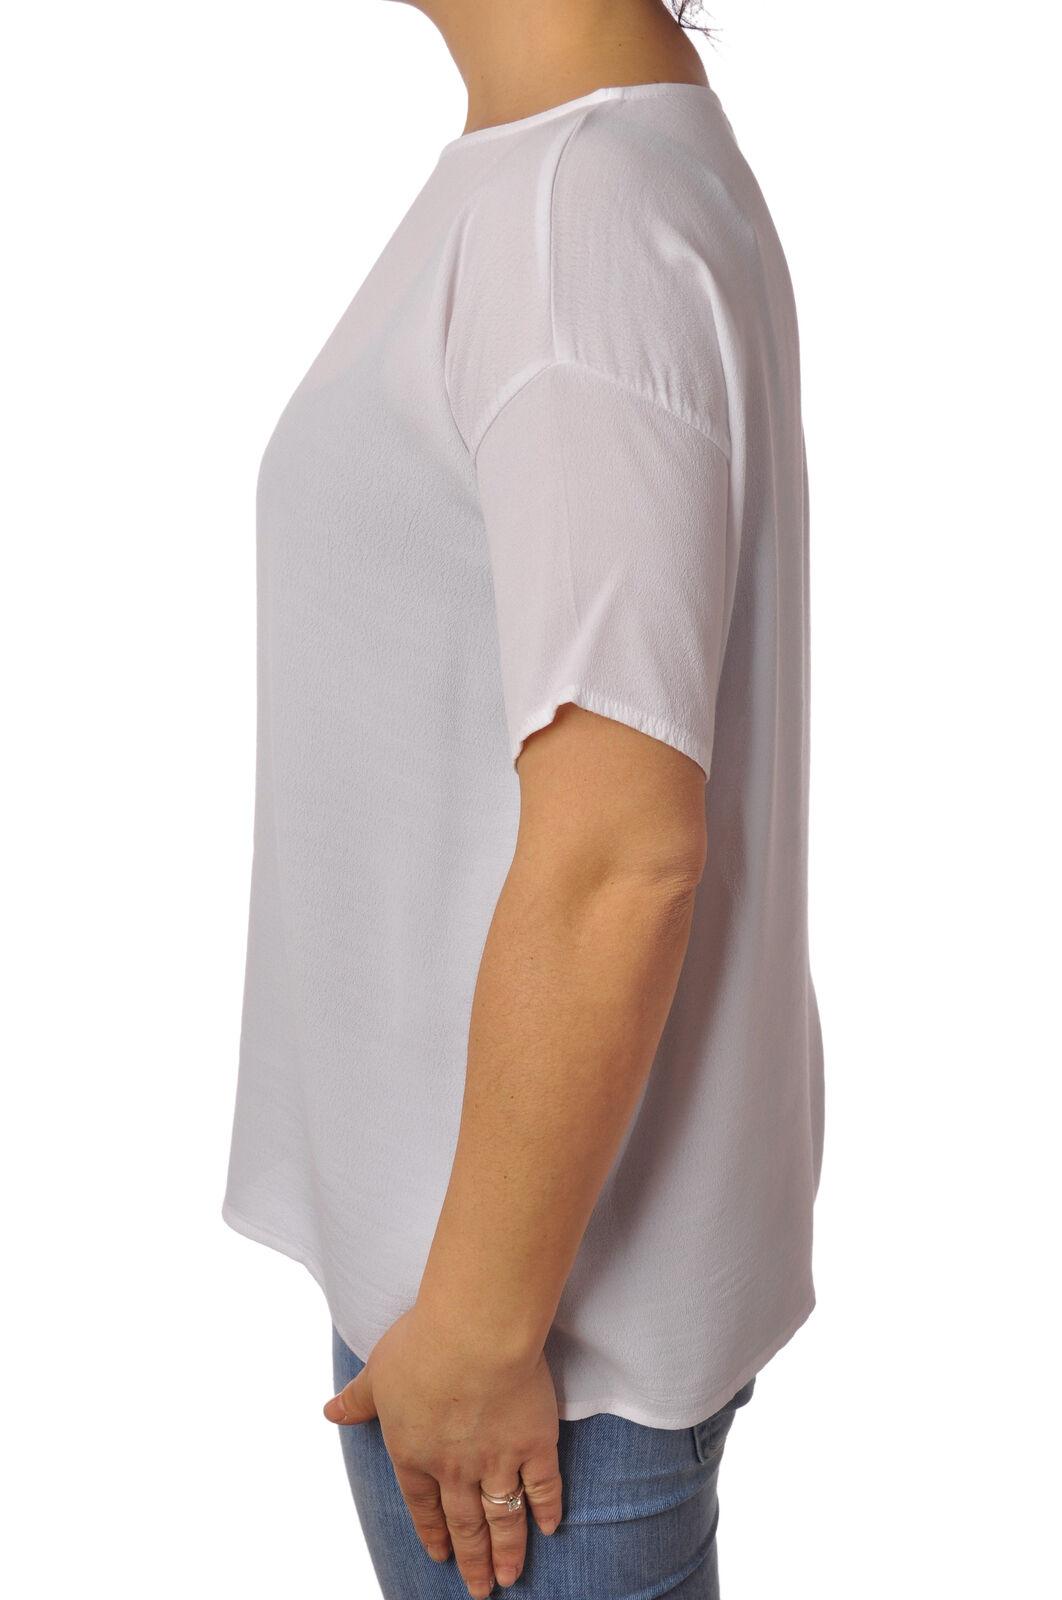 CROSSLEY - Shirts-Blouses - 5087020F183816 Woman - Weiß - 5087020F183816 - 8f7c3f